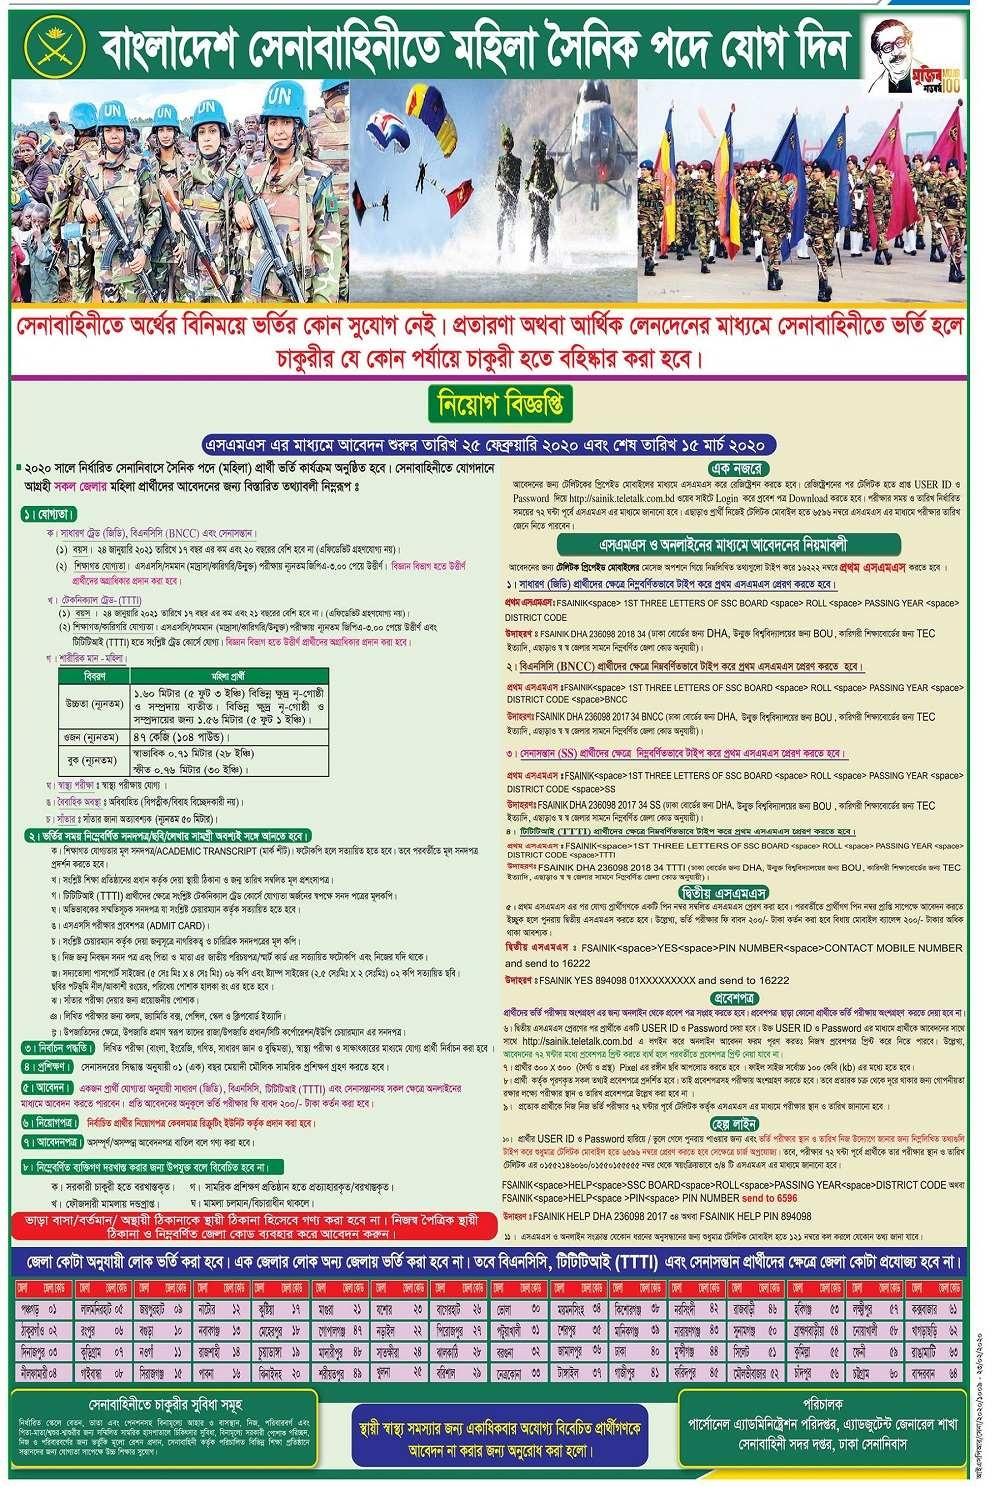 Bangladesh army circular & application form 2020